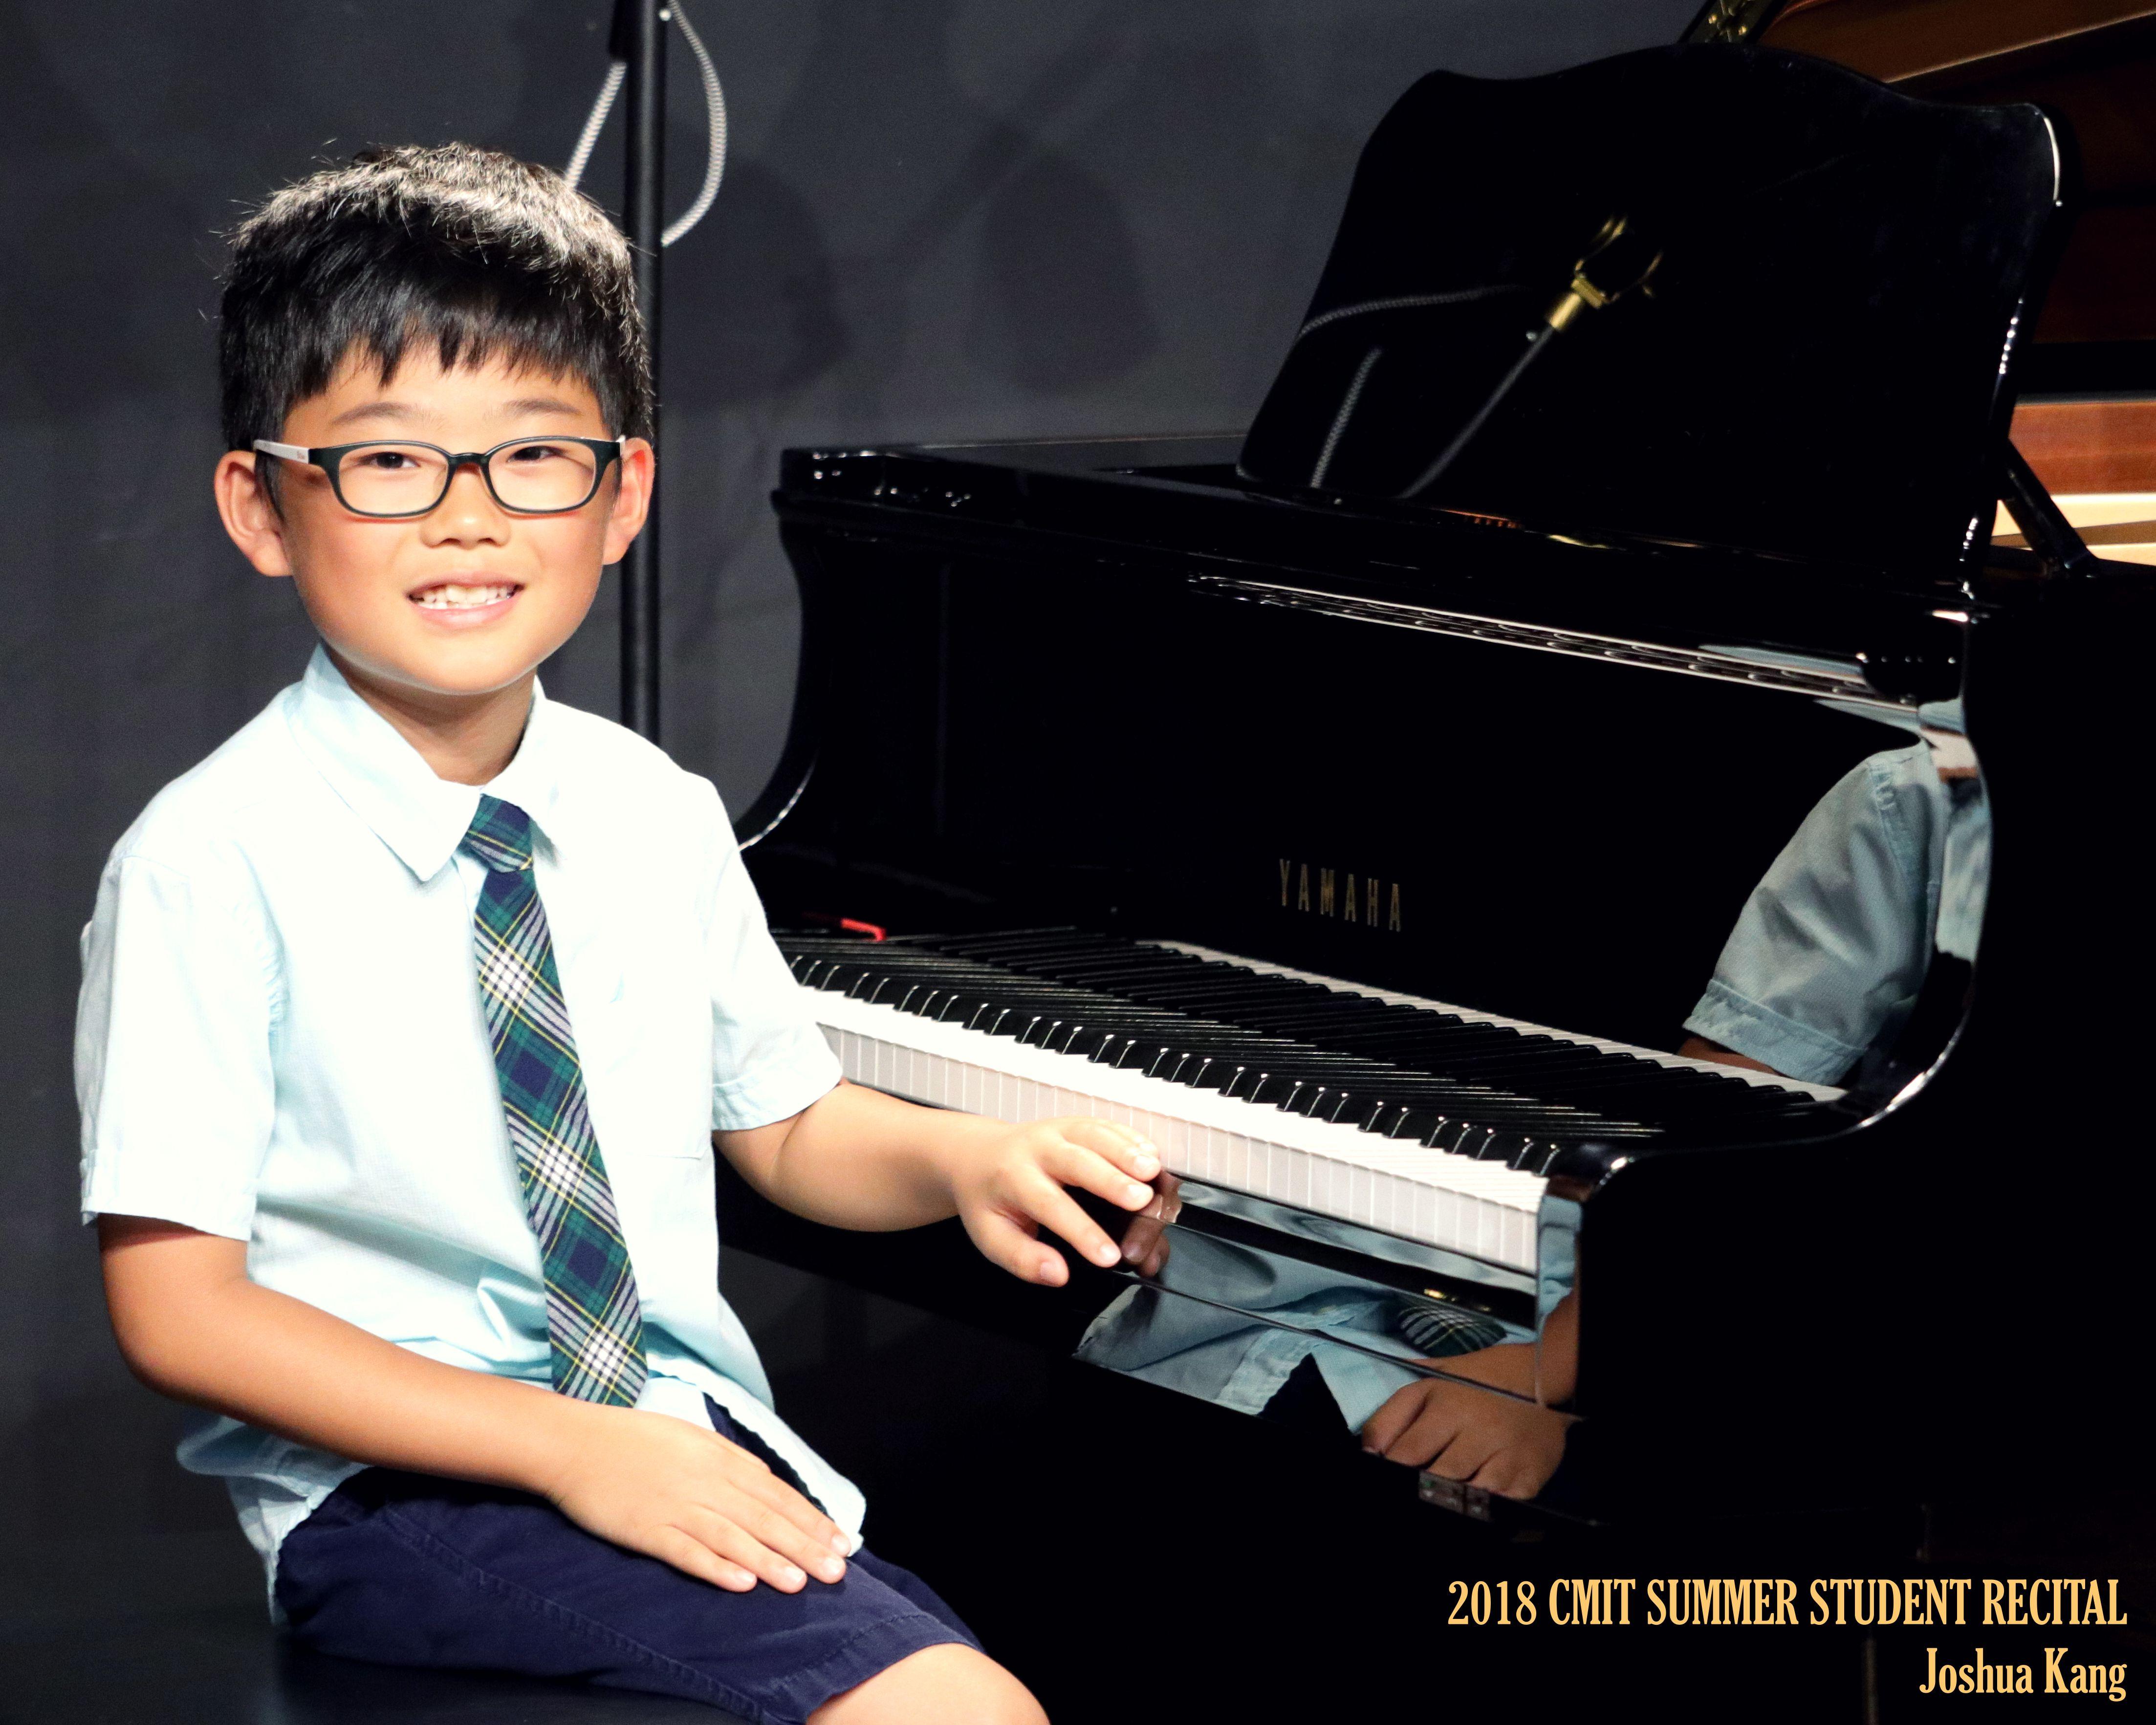 05 Joshua Kang